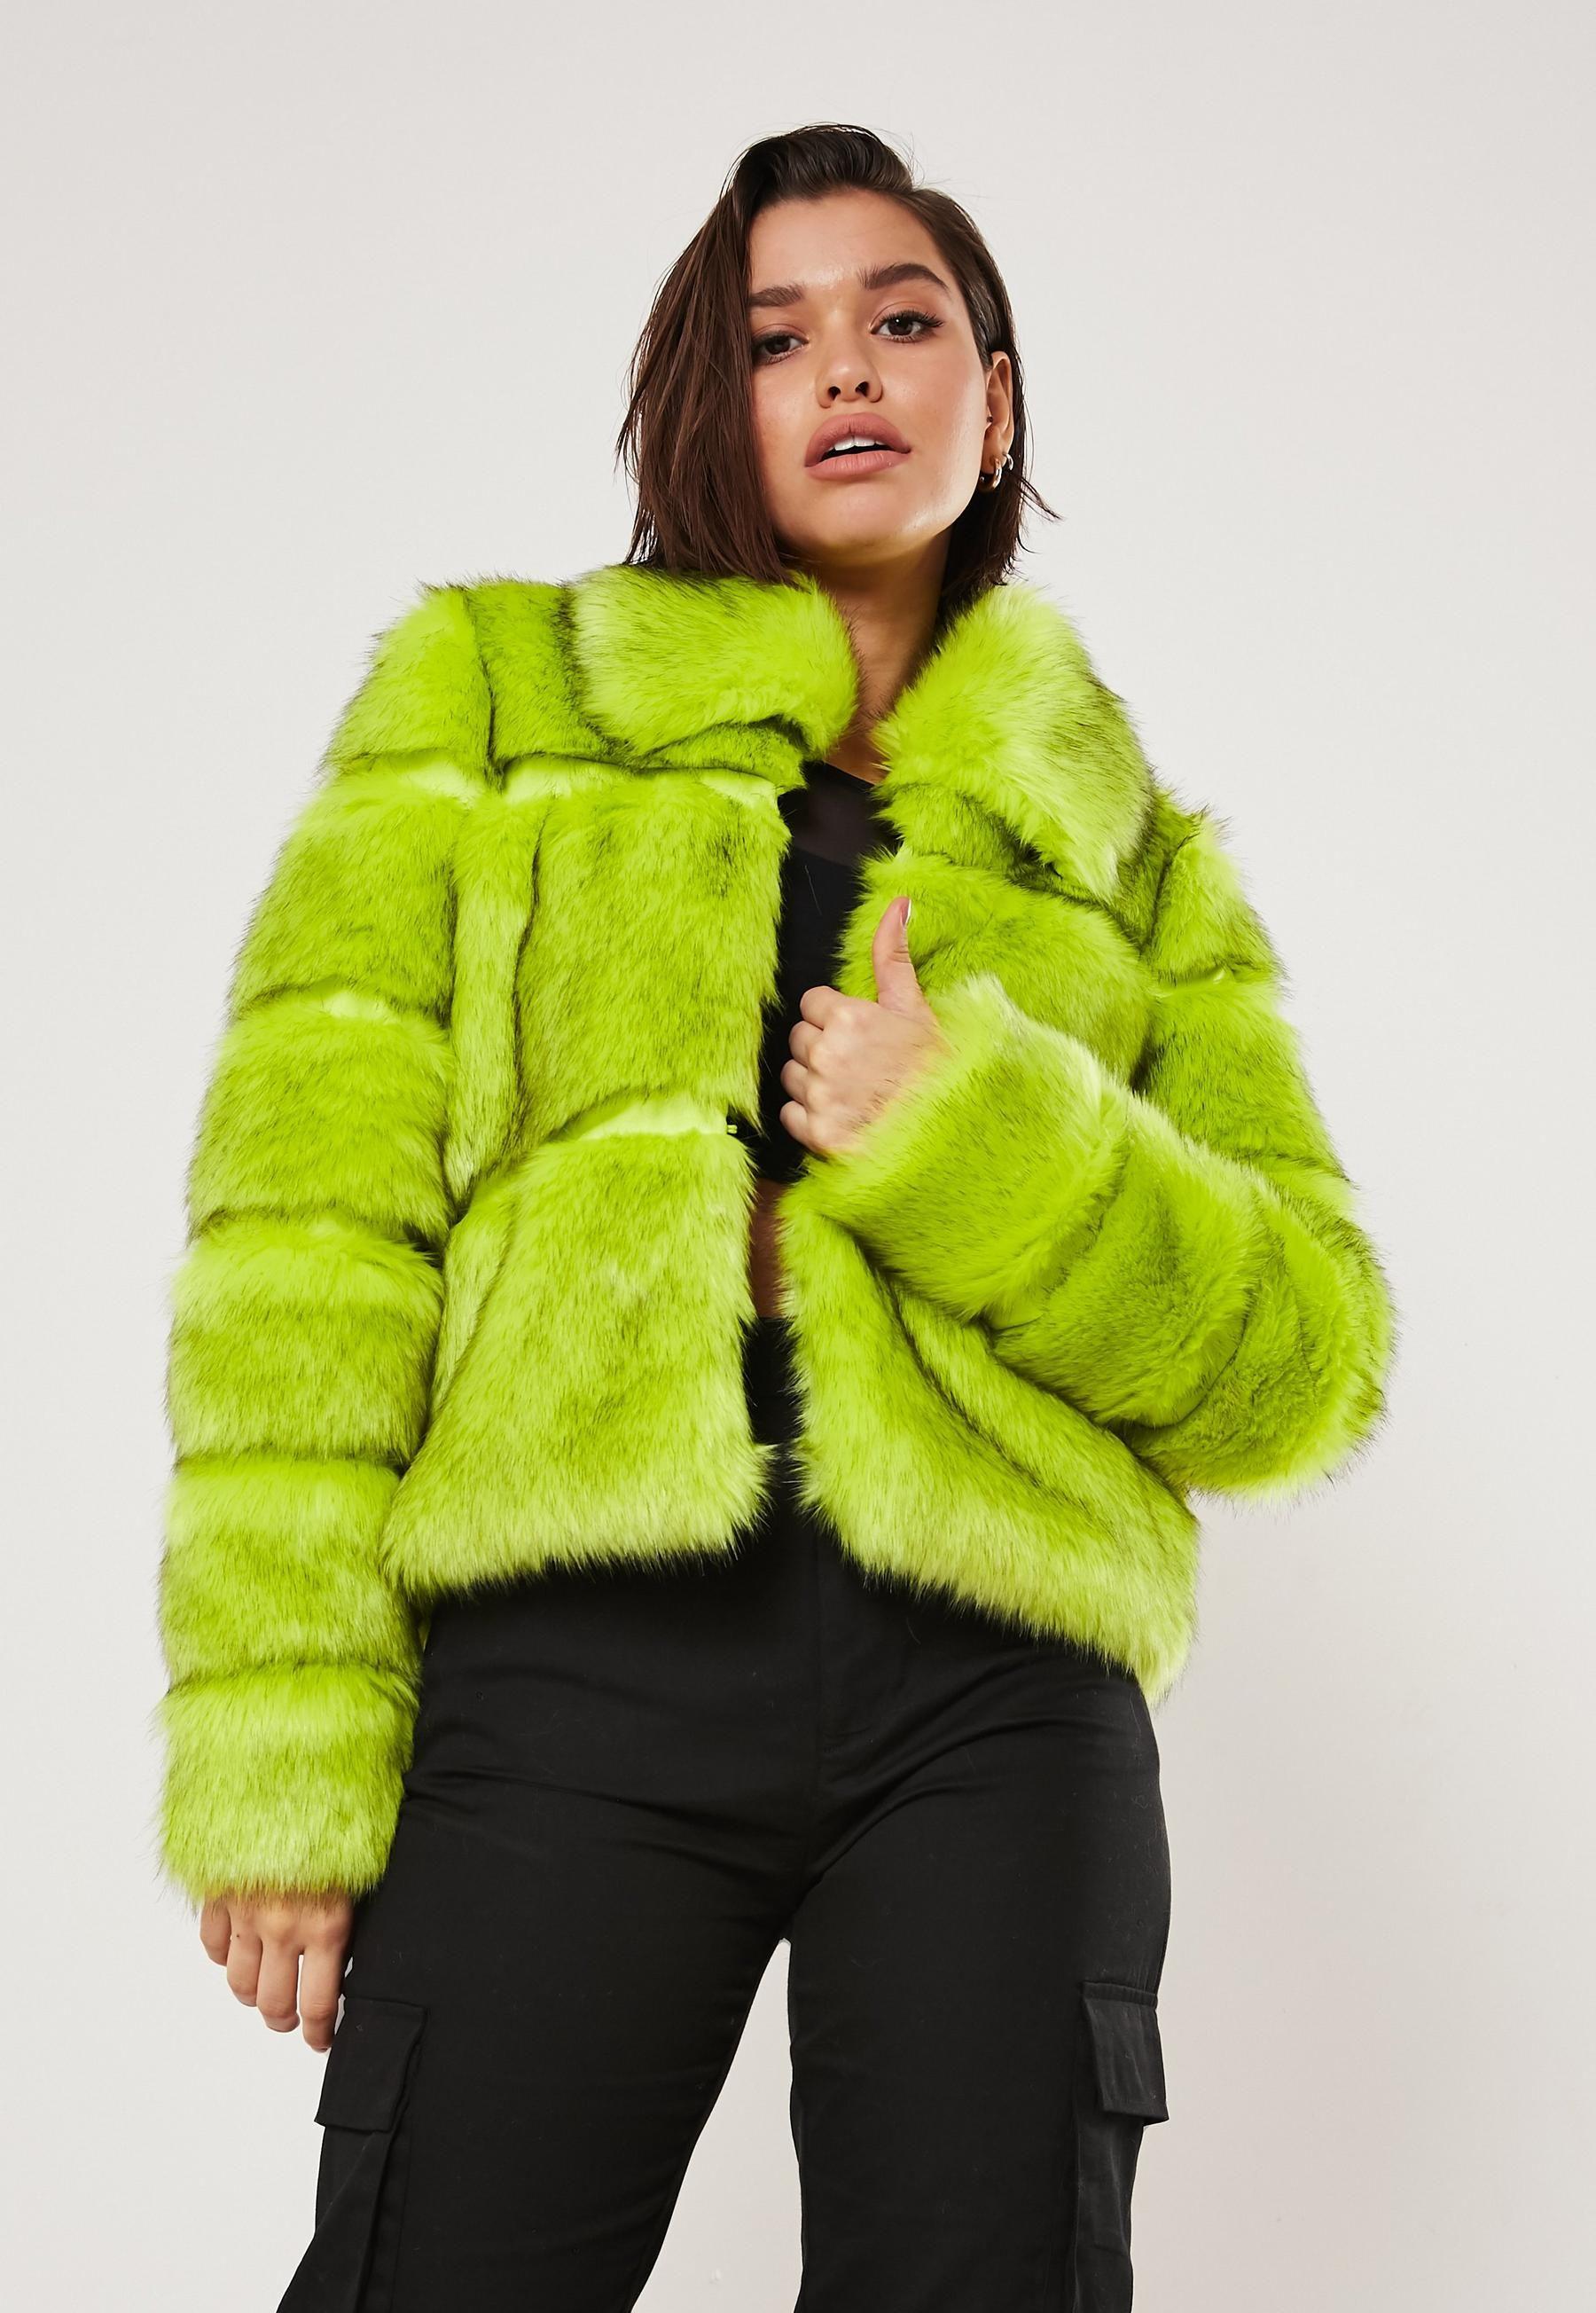 Neon Green Short Pelted Faux Fur Coat Missguided Green Fur Coat Coats Jackets Women Neon Green Shorts [ 2608 x 1800 Pixel ]